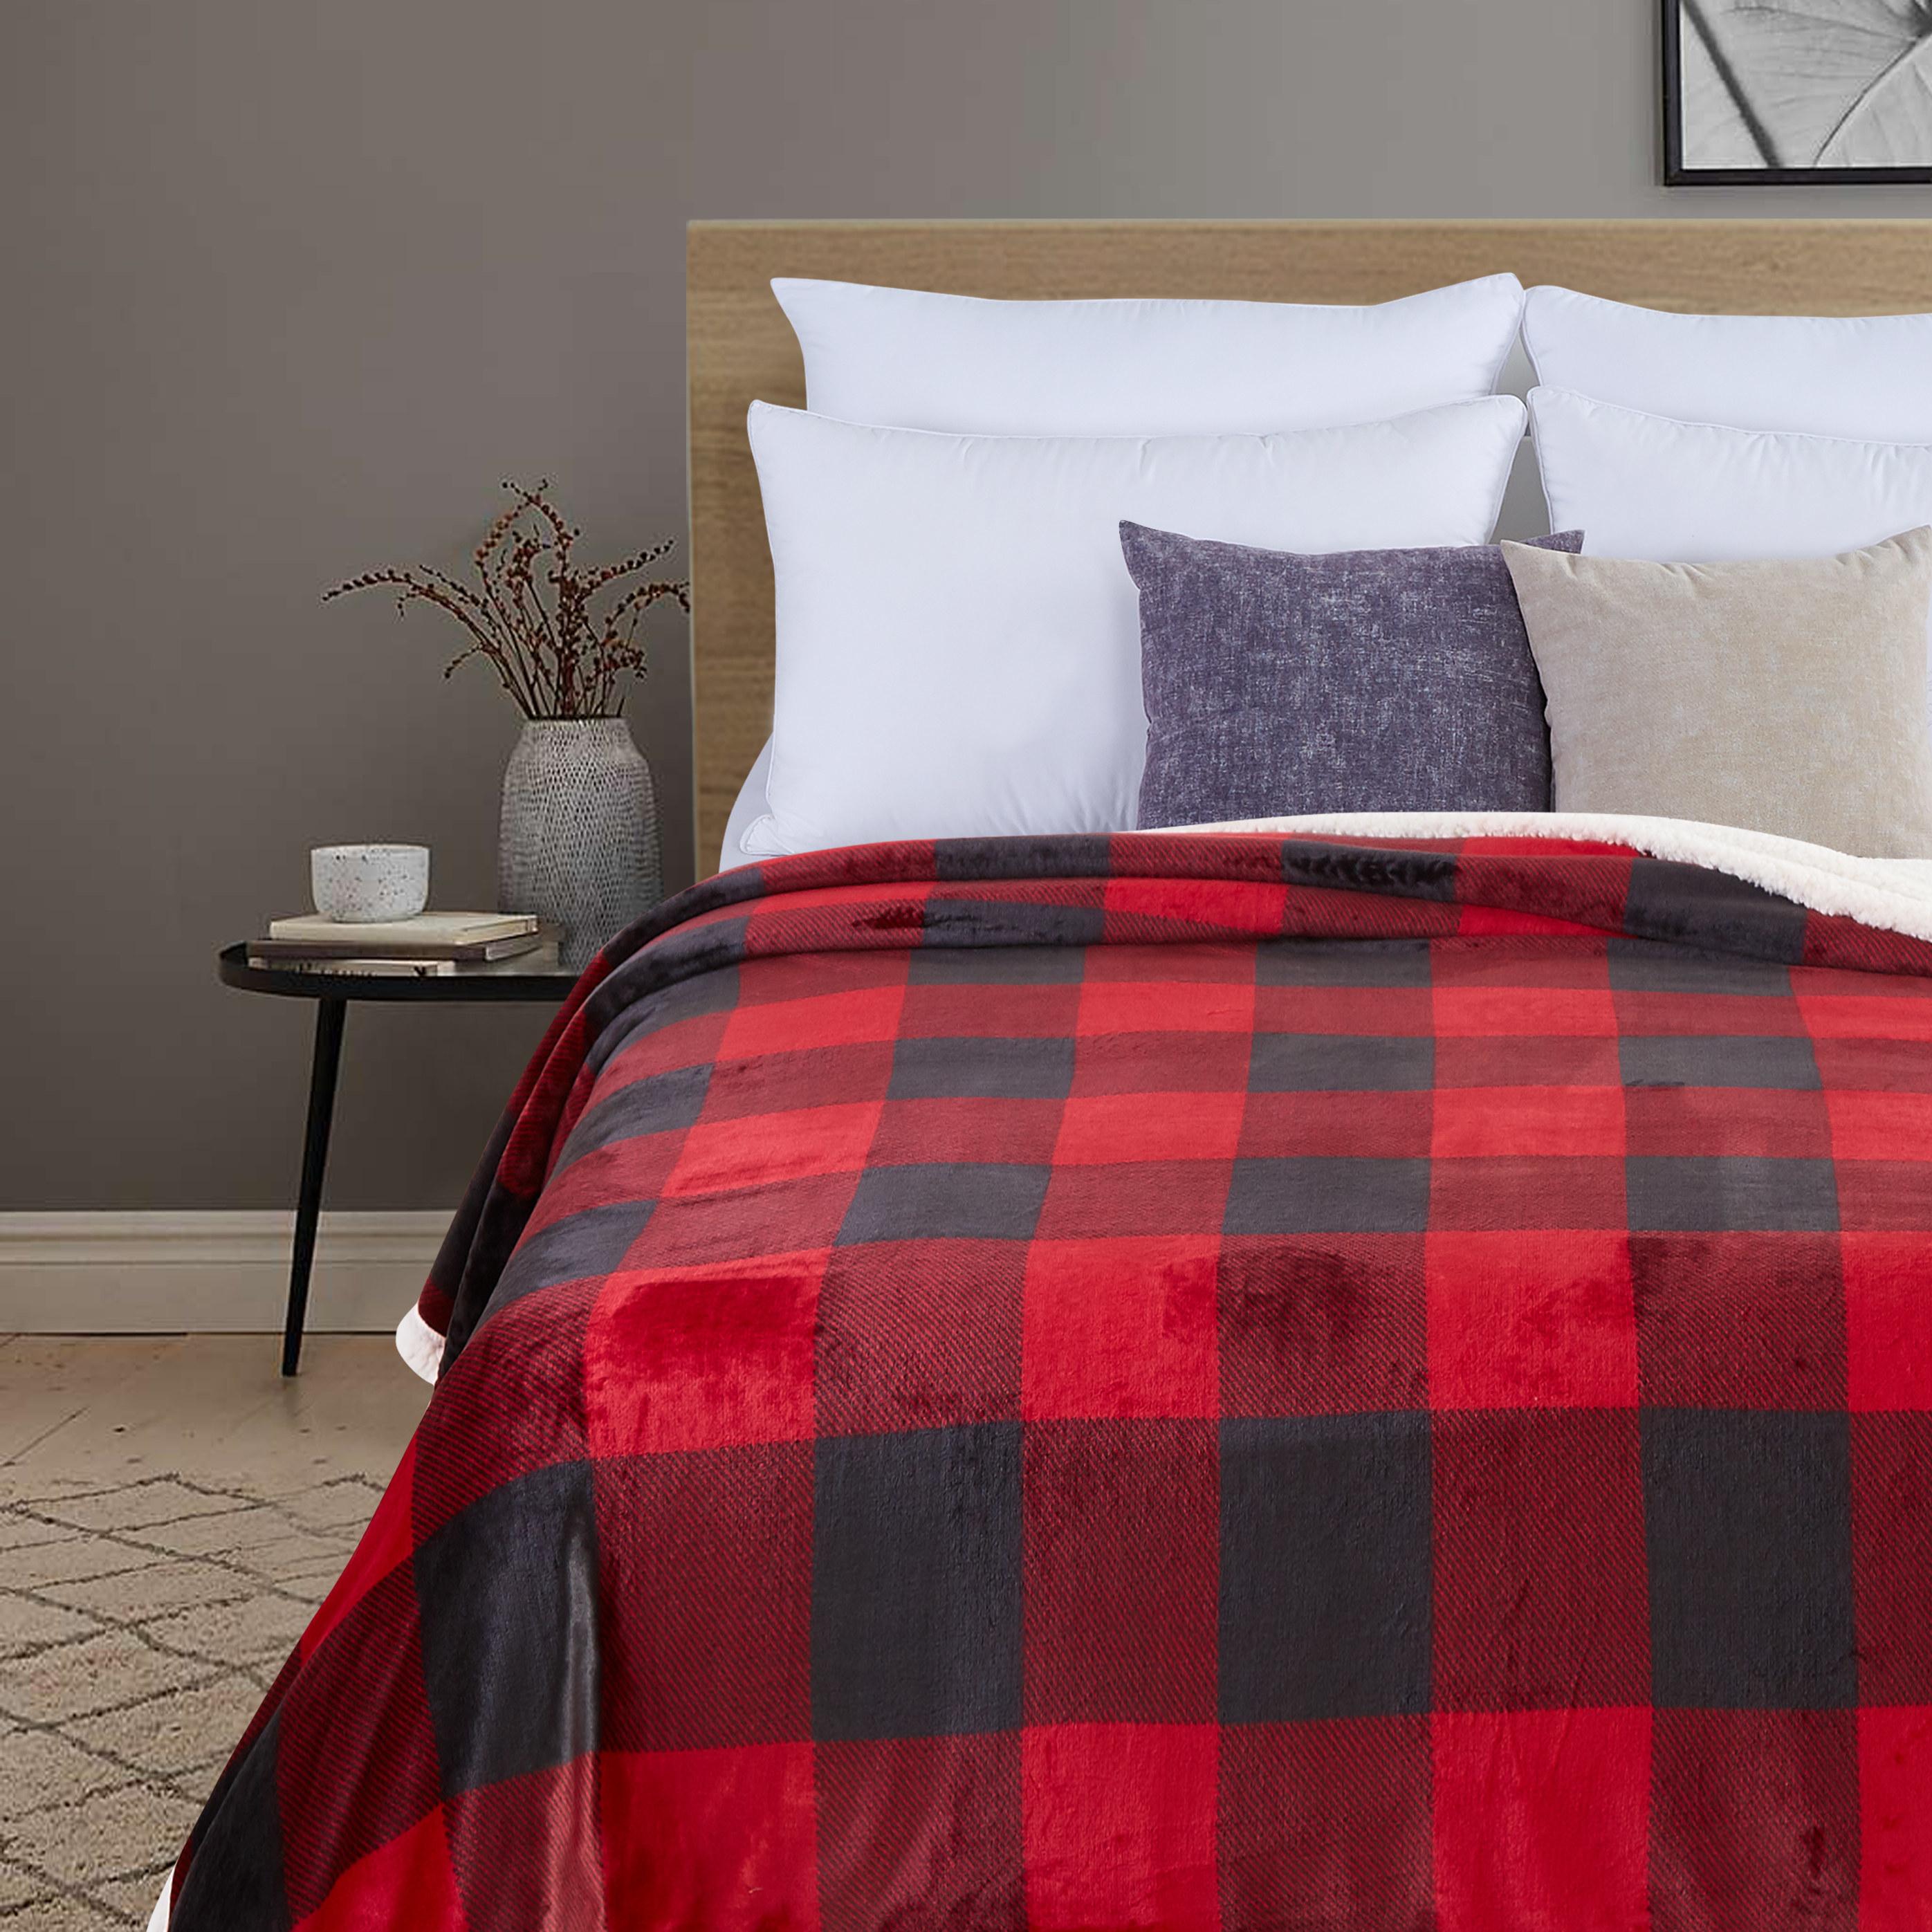 buffalo plaid sherpa blanket on a bed